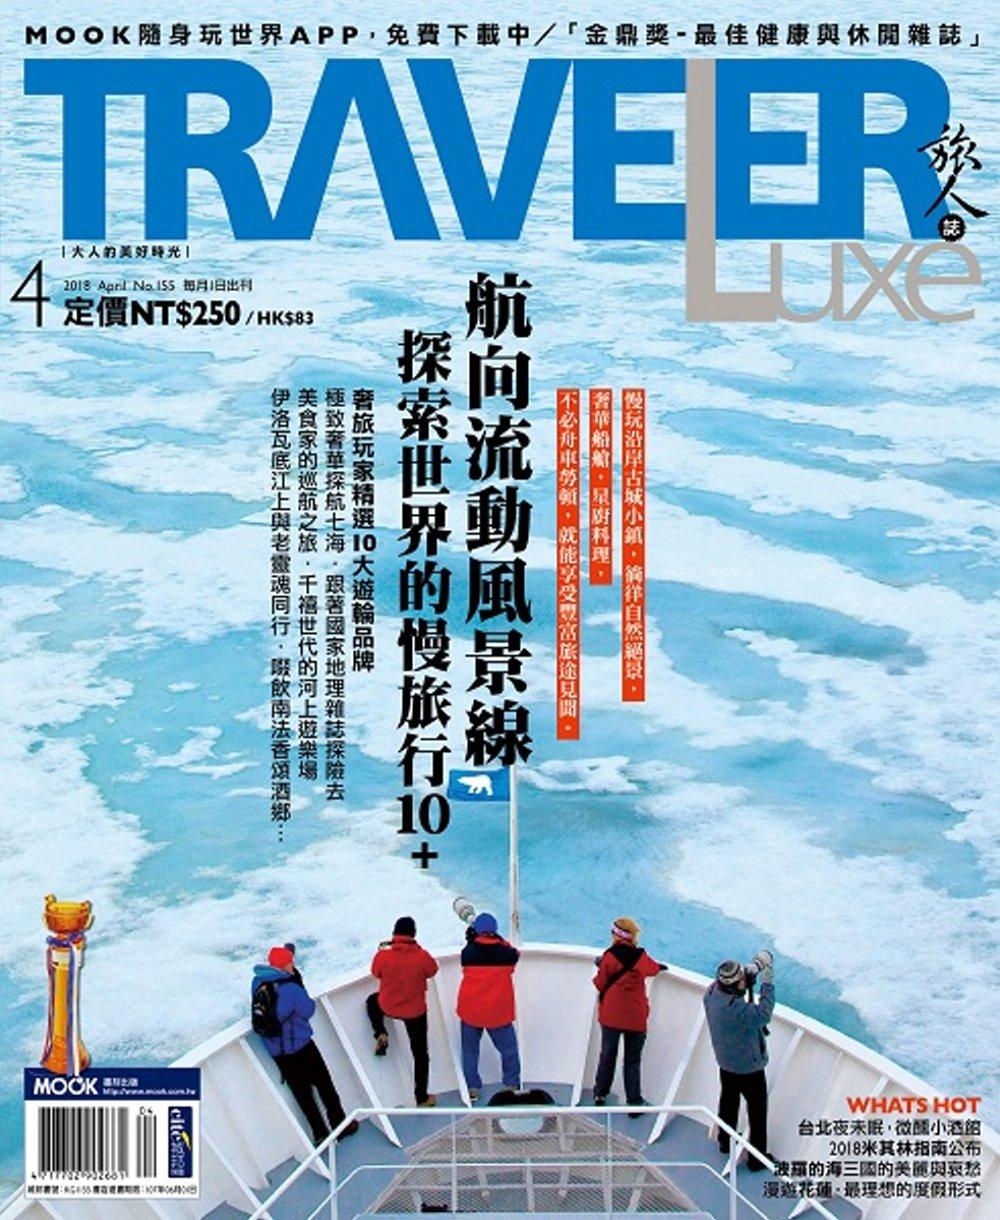 TRAVELER LUXE 旅人誌 4月號/2018 第155期